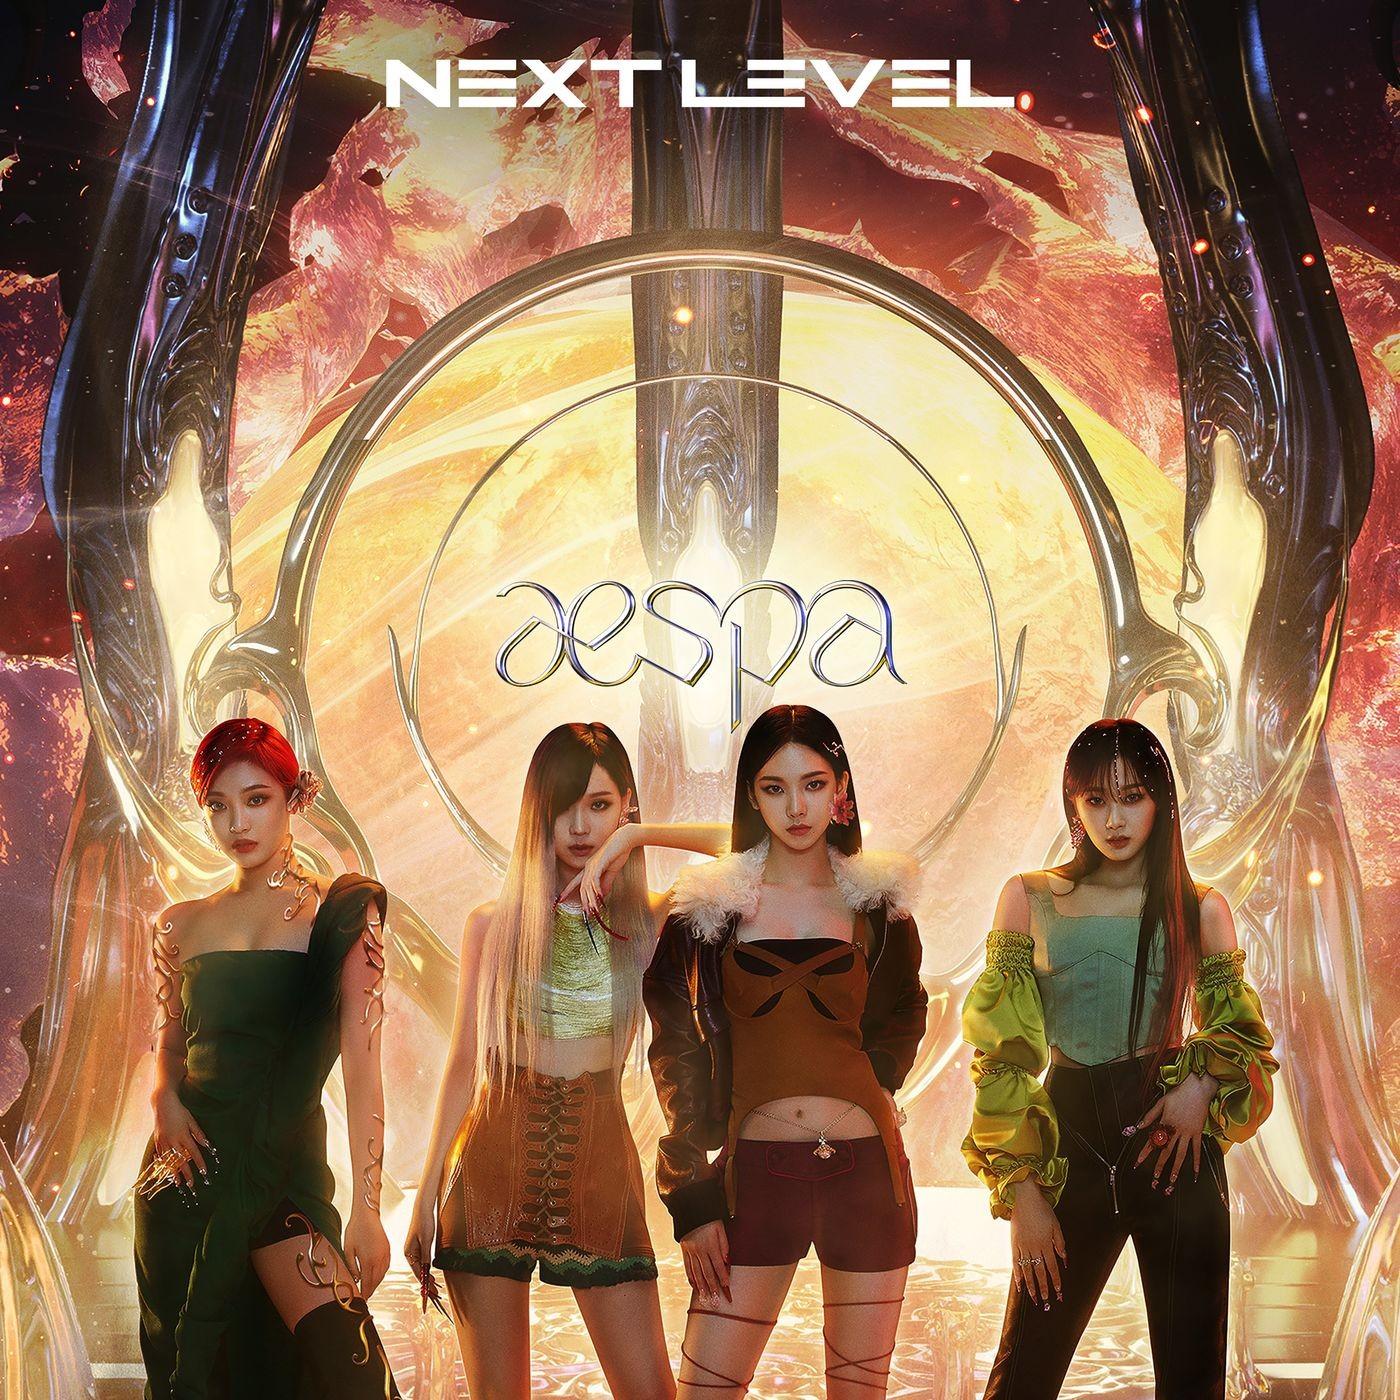 aespa – Next Level [FLAC + MP3 320 / WEB] [2021.05.17]